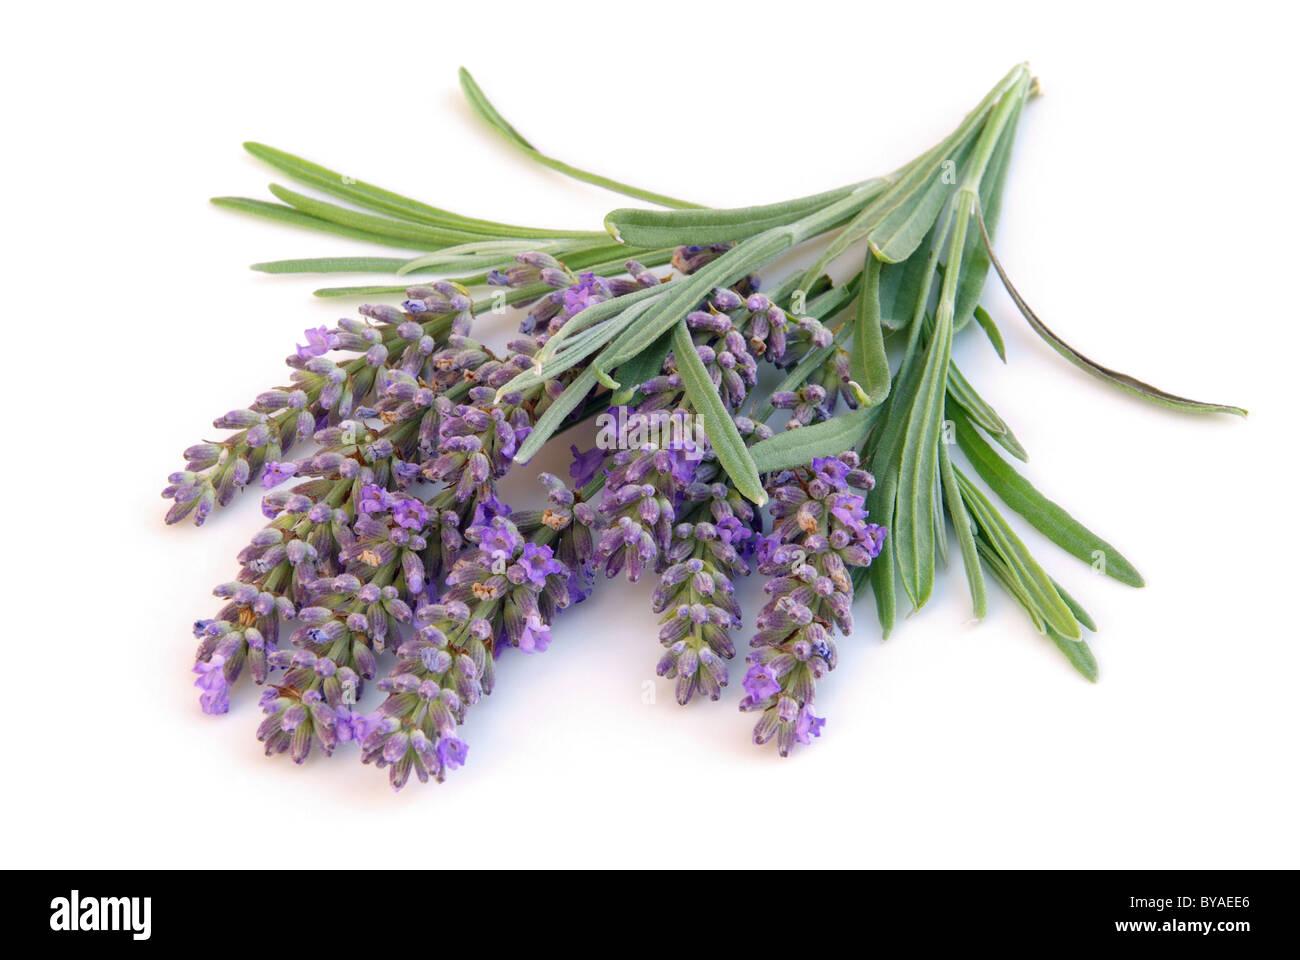 Lavendel freigestellt - lavender isolated 02 - Stock Image